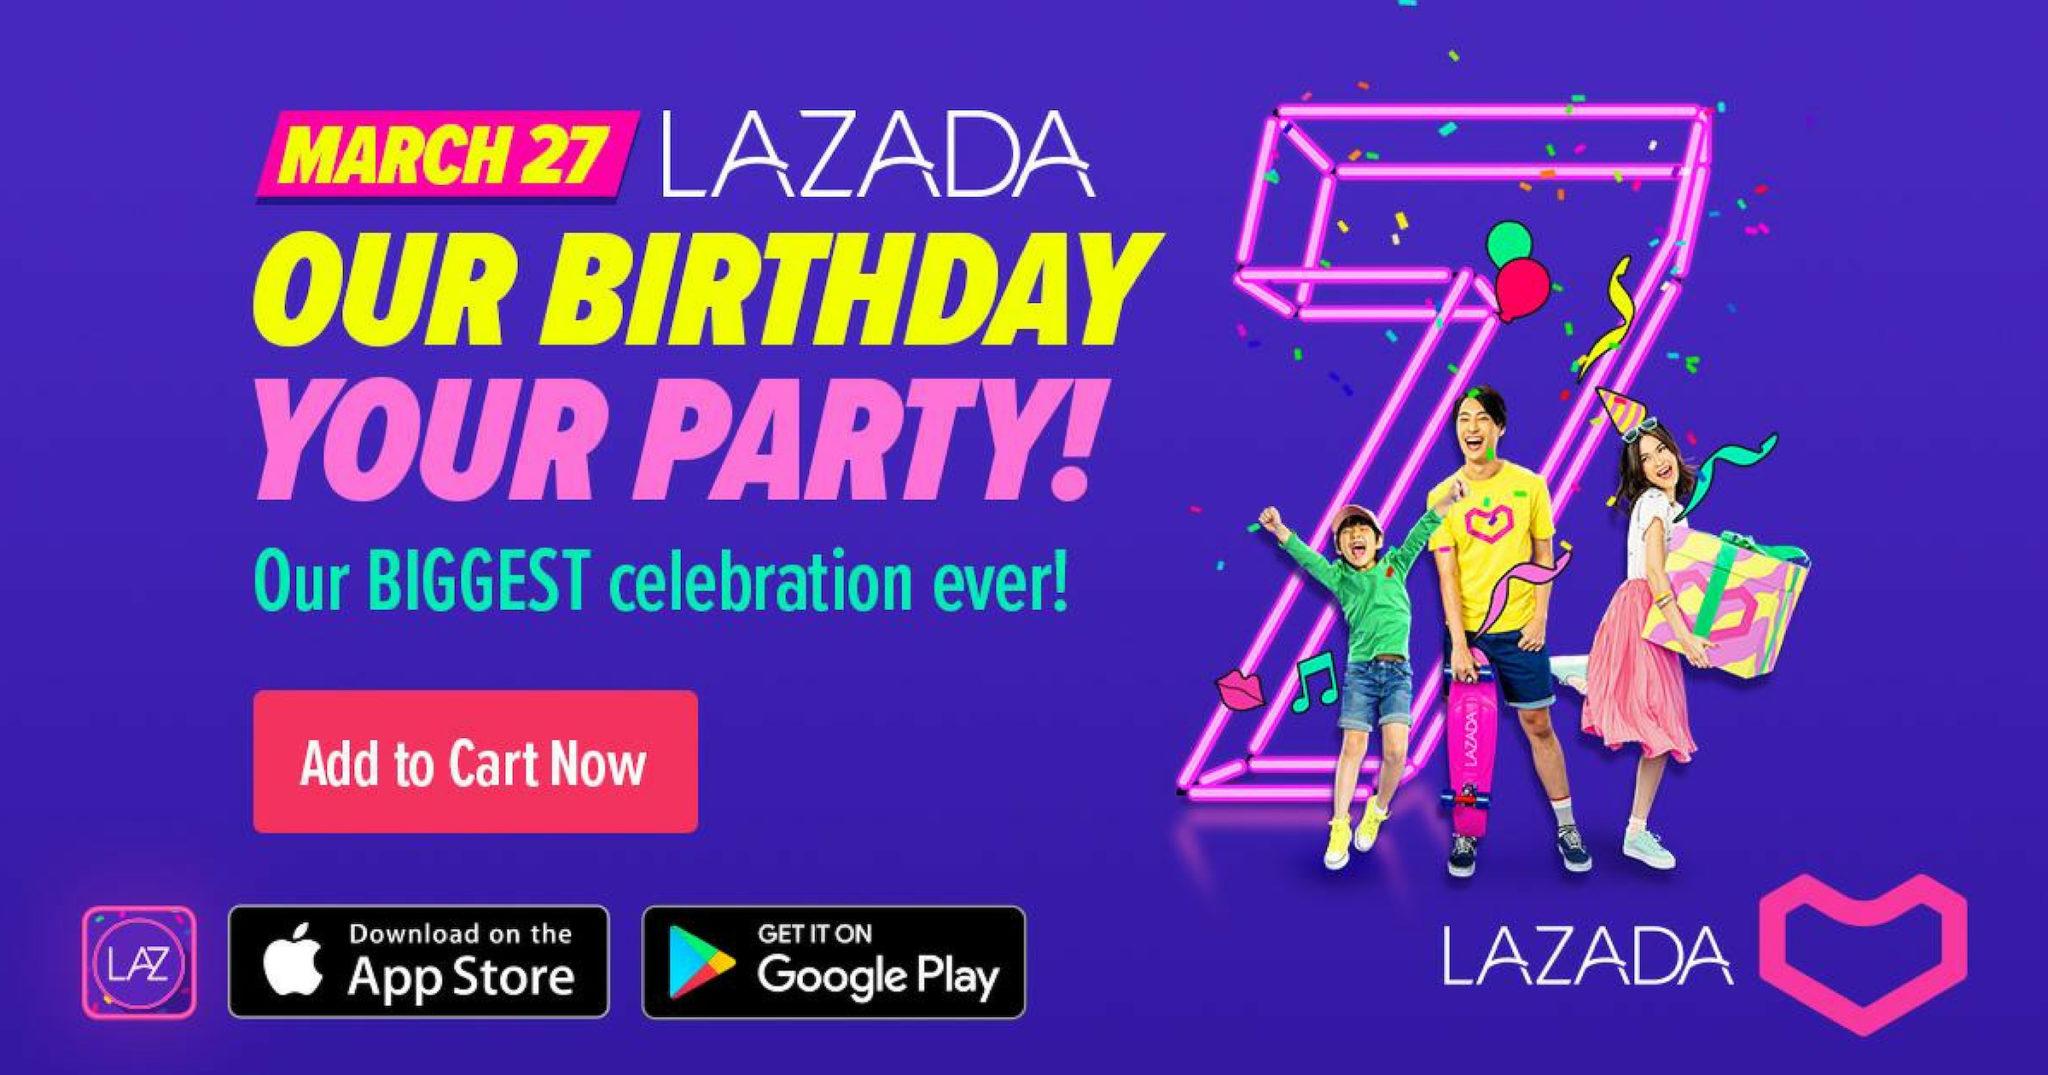 Lazada 7th Birthday Party Header